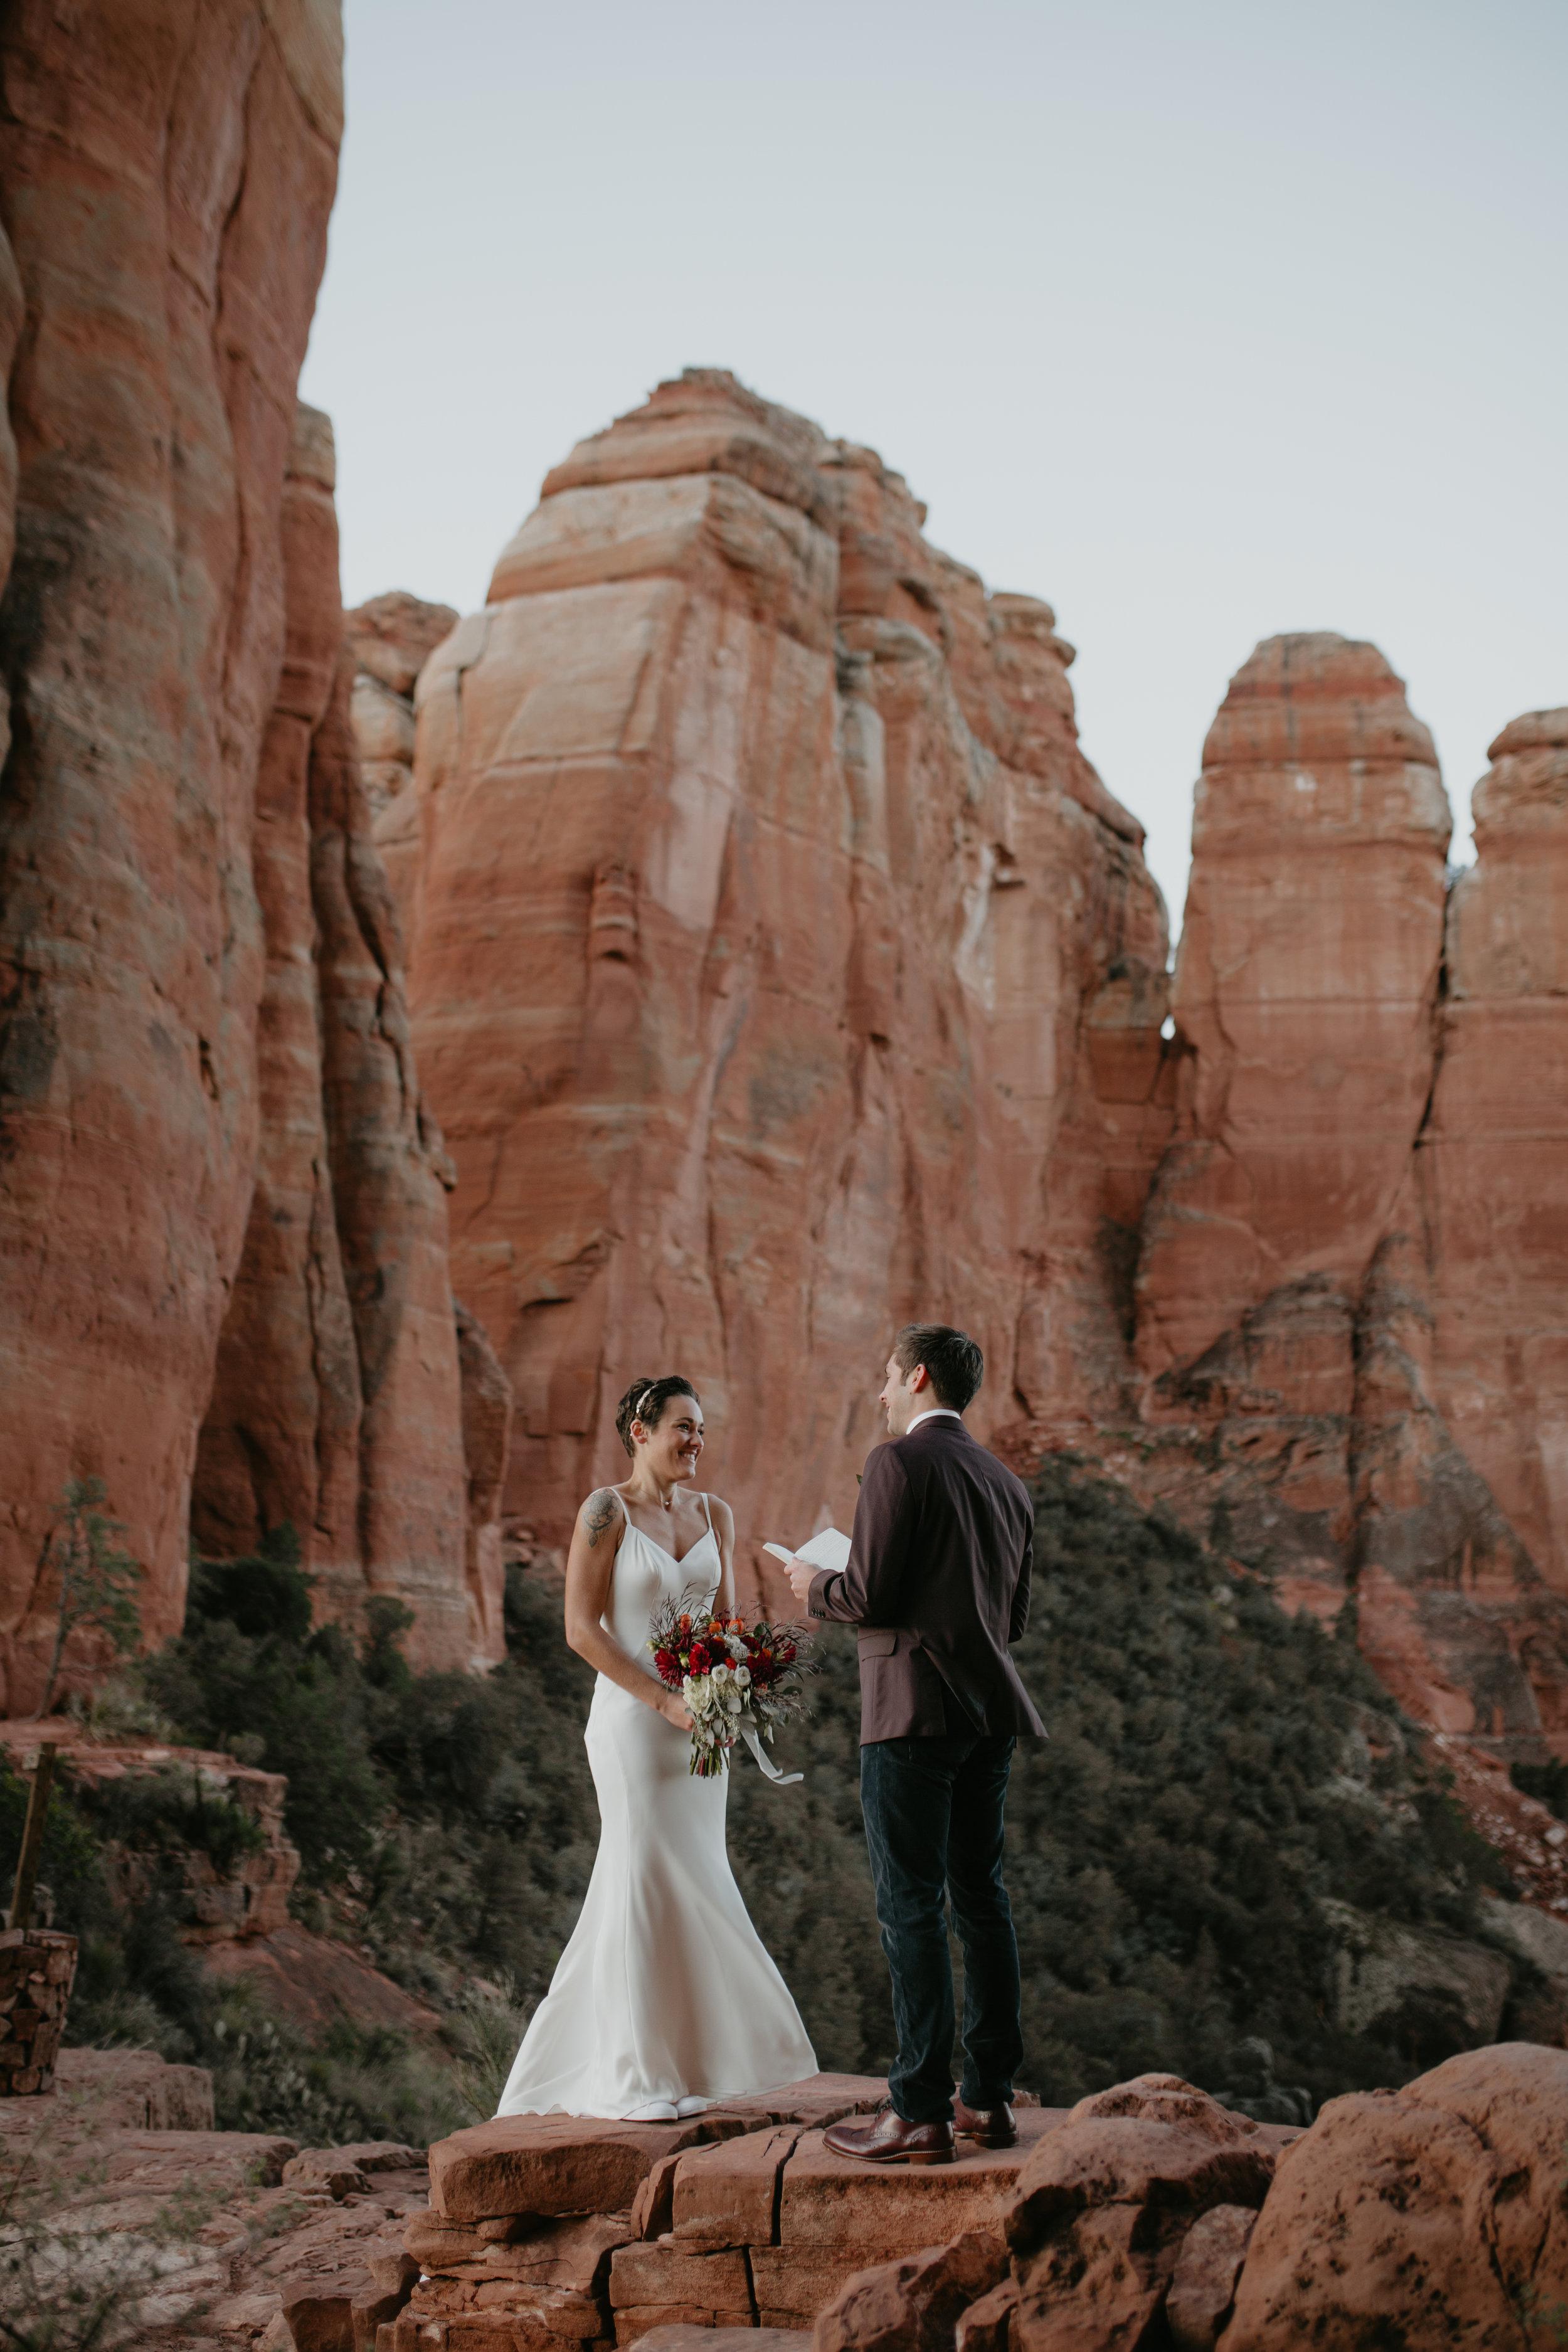 nicole-daacke-photography-sedona-arizona-destination-elopement-wedding-photographer-catherdral-rock-hiking-elopement-sedona-river-elopement-photos-desert-rock-wedding-photographer-laid-back-spontaneous-elopement-34.jpg